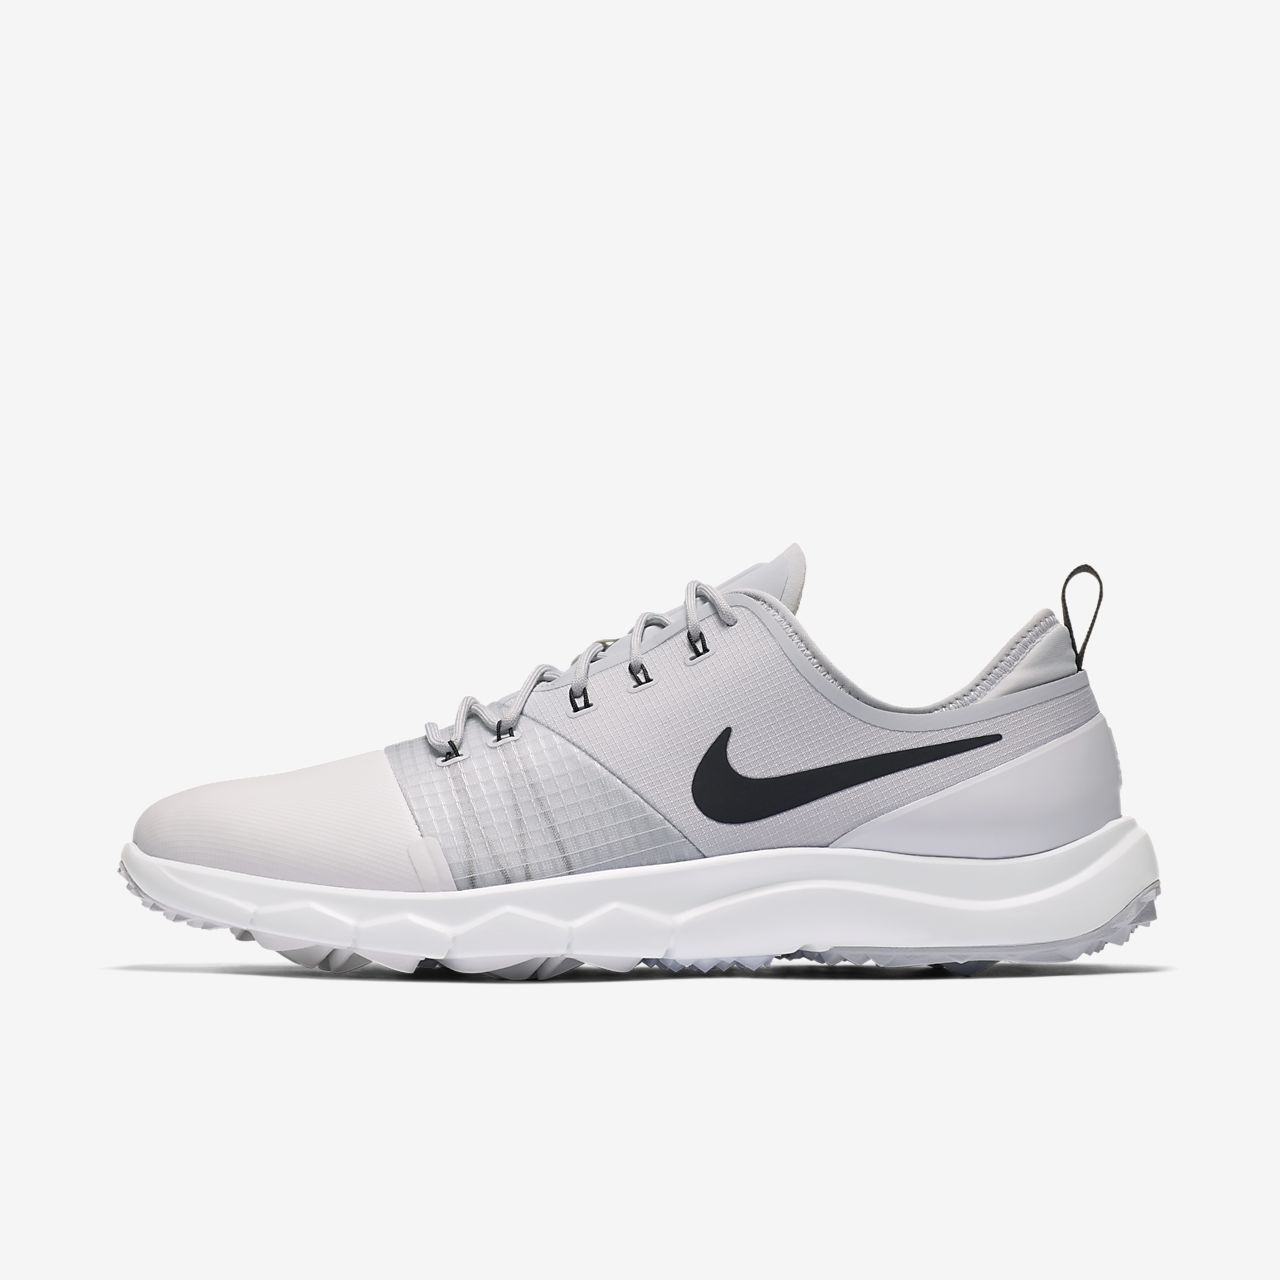 wholesale dealer 31f96 42bdf Damskie buty do golfa Nike FI Impact 3